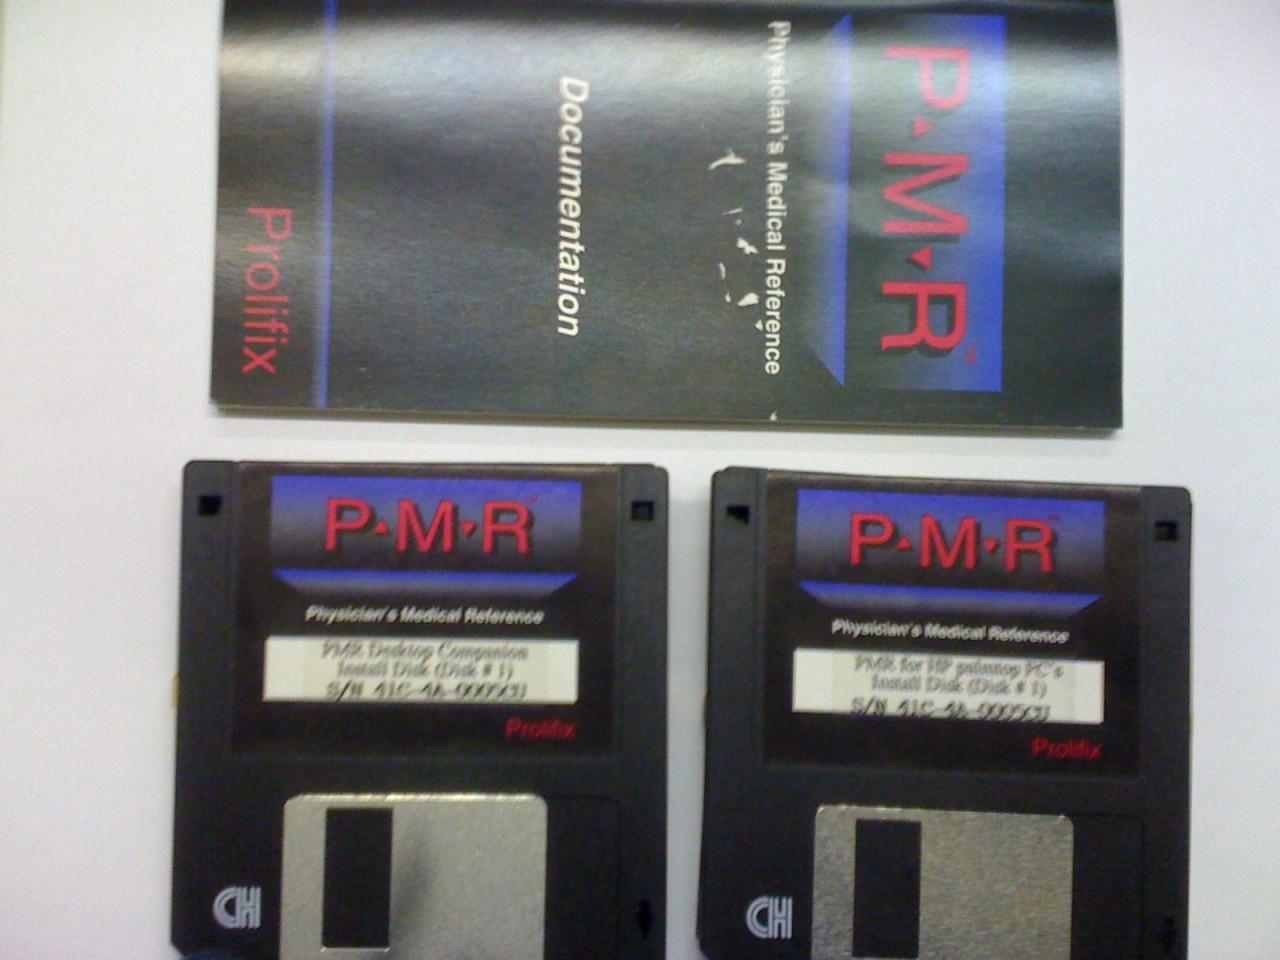 95LX Palmtop PCs Image 1